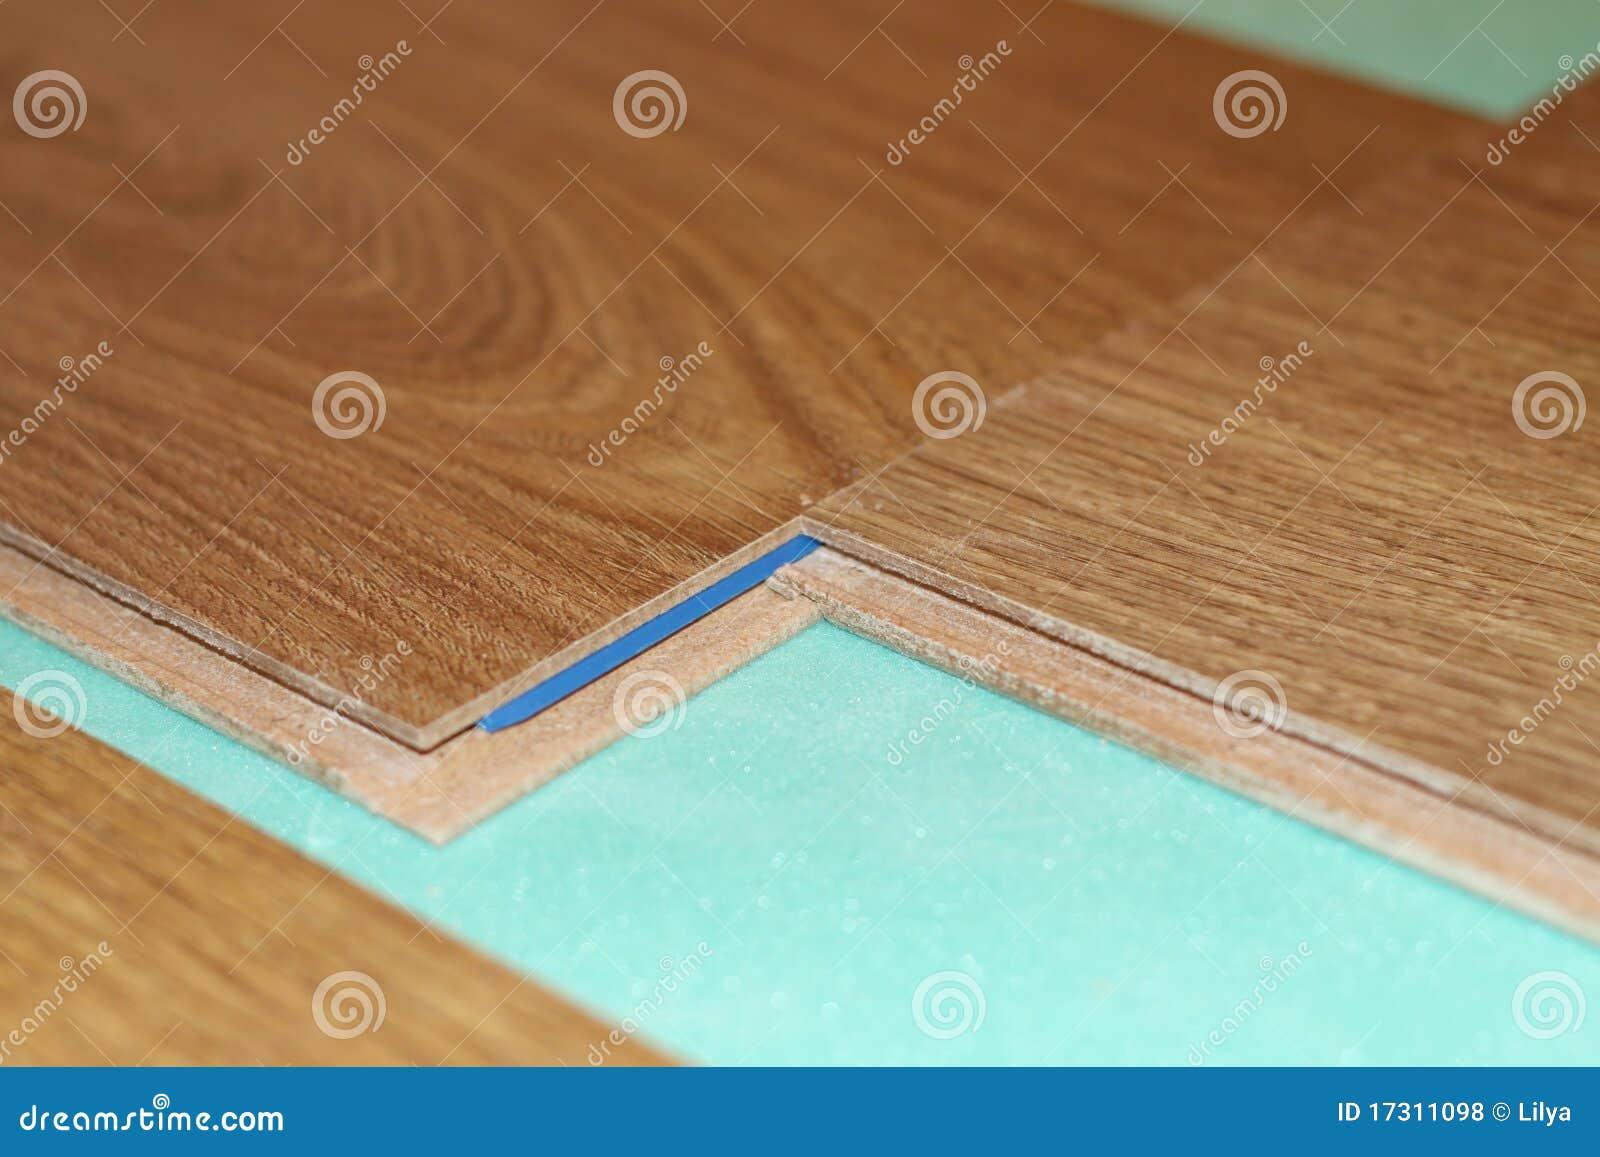 Laminate Flooring Laminate Flooring Electric Saw